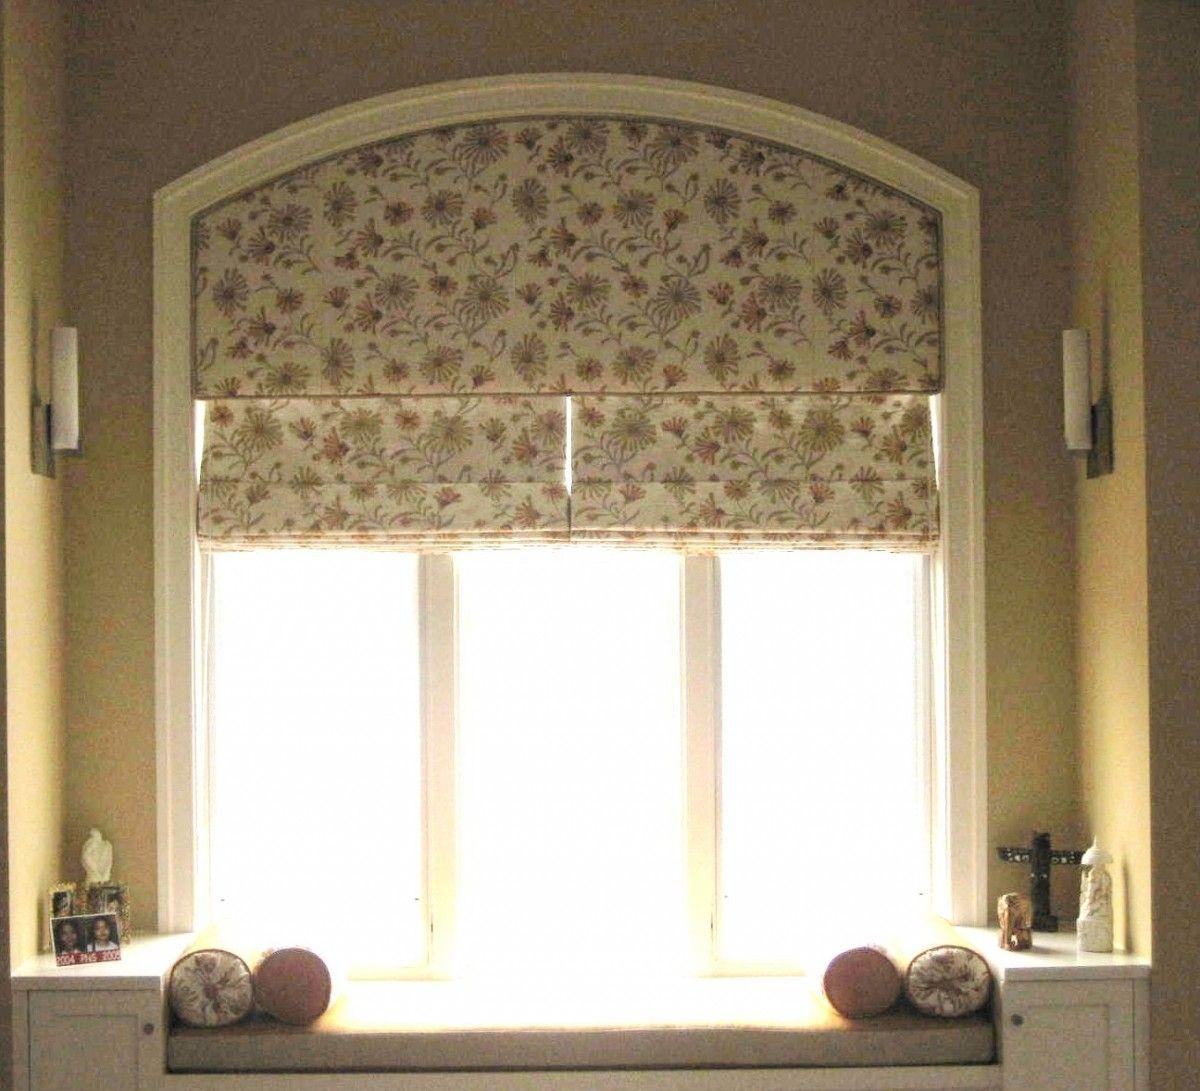 Arched window treatments diy campernel design diy